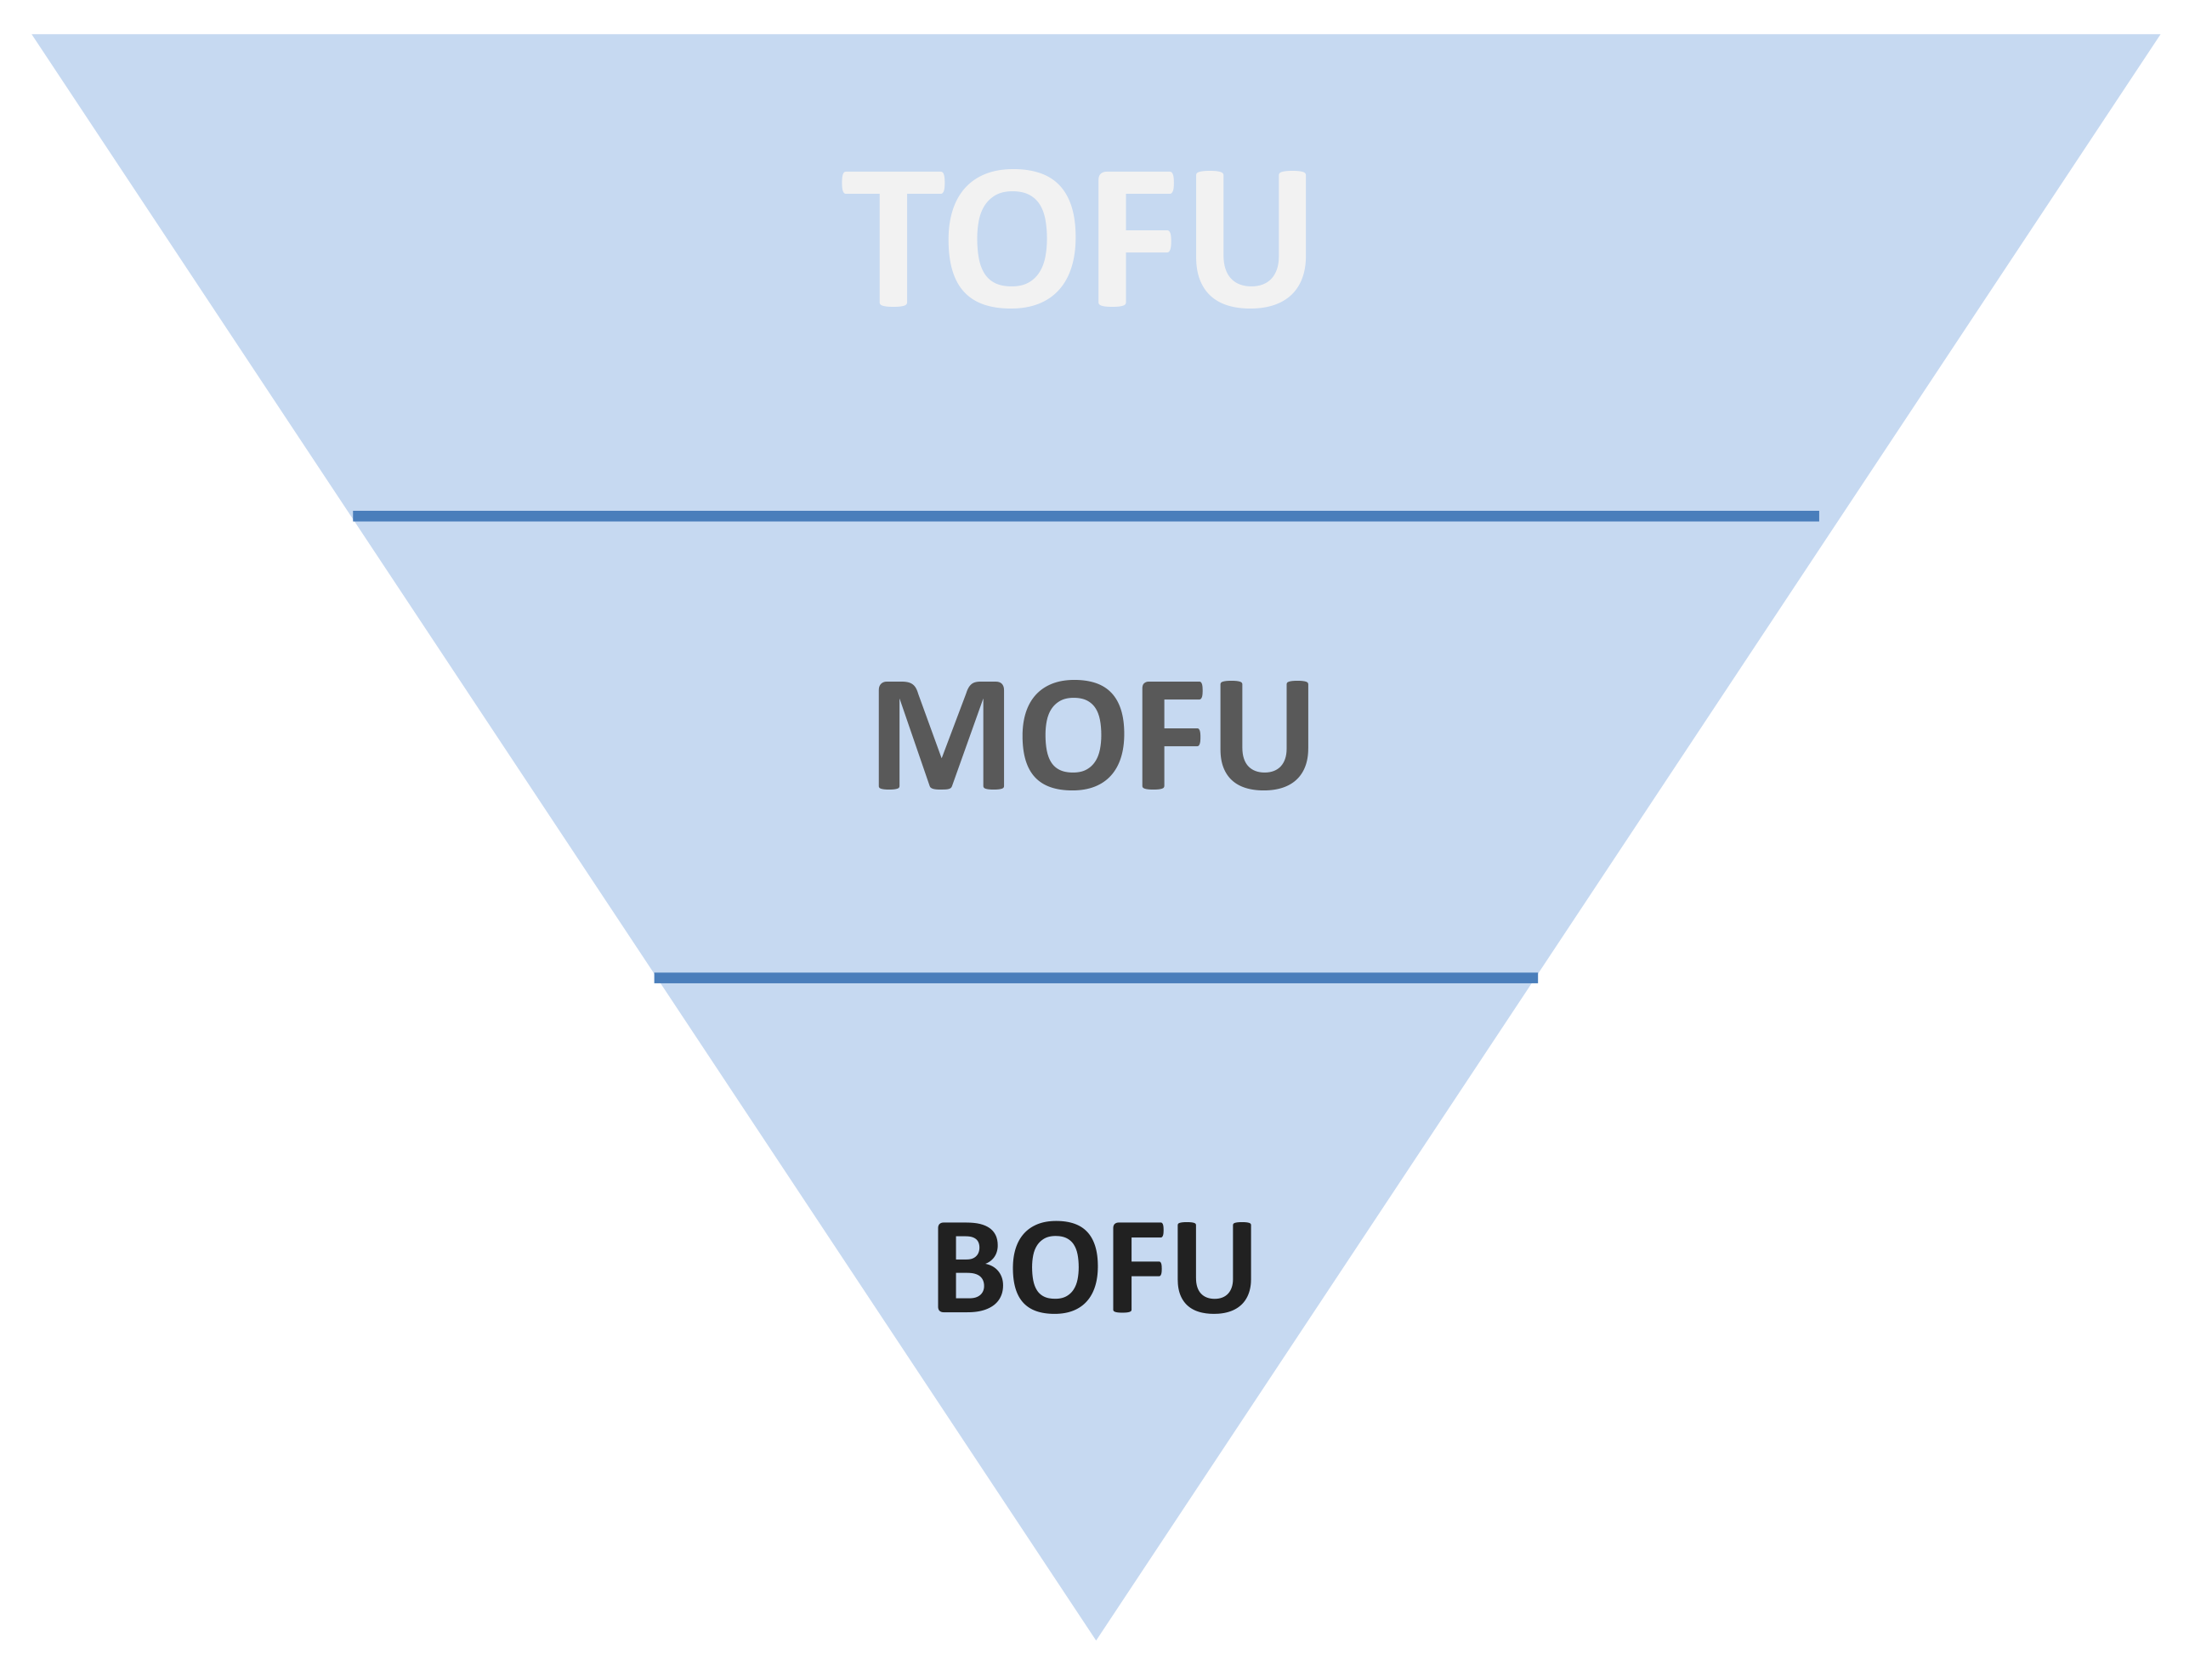 funnel-tofu-mofu-e1551264351861.png